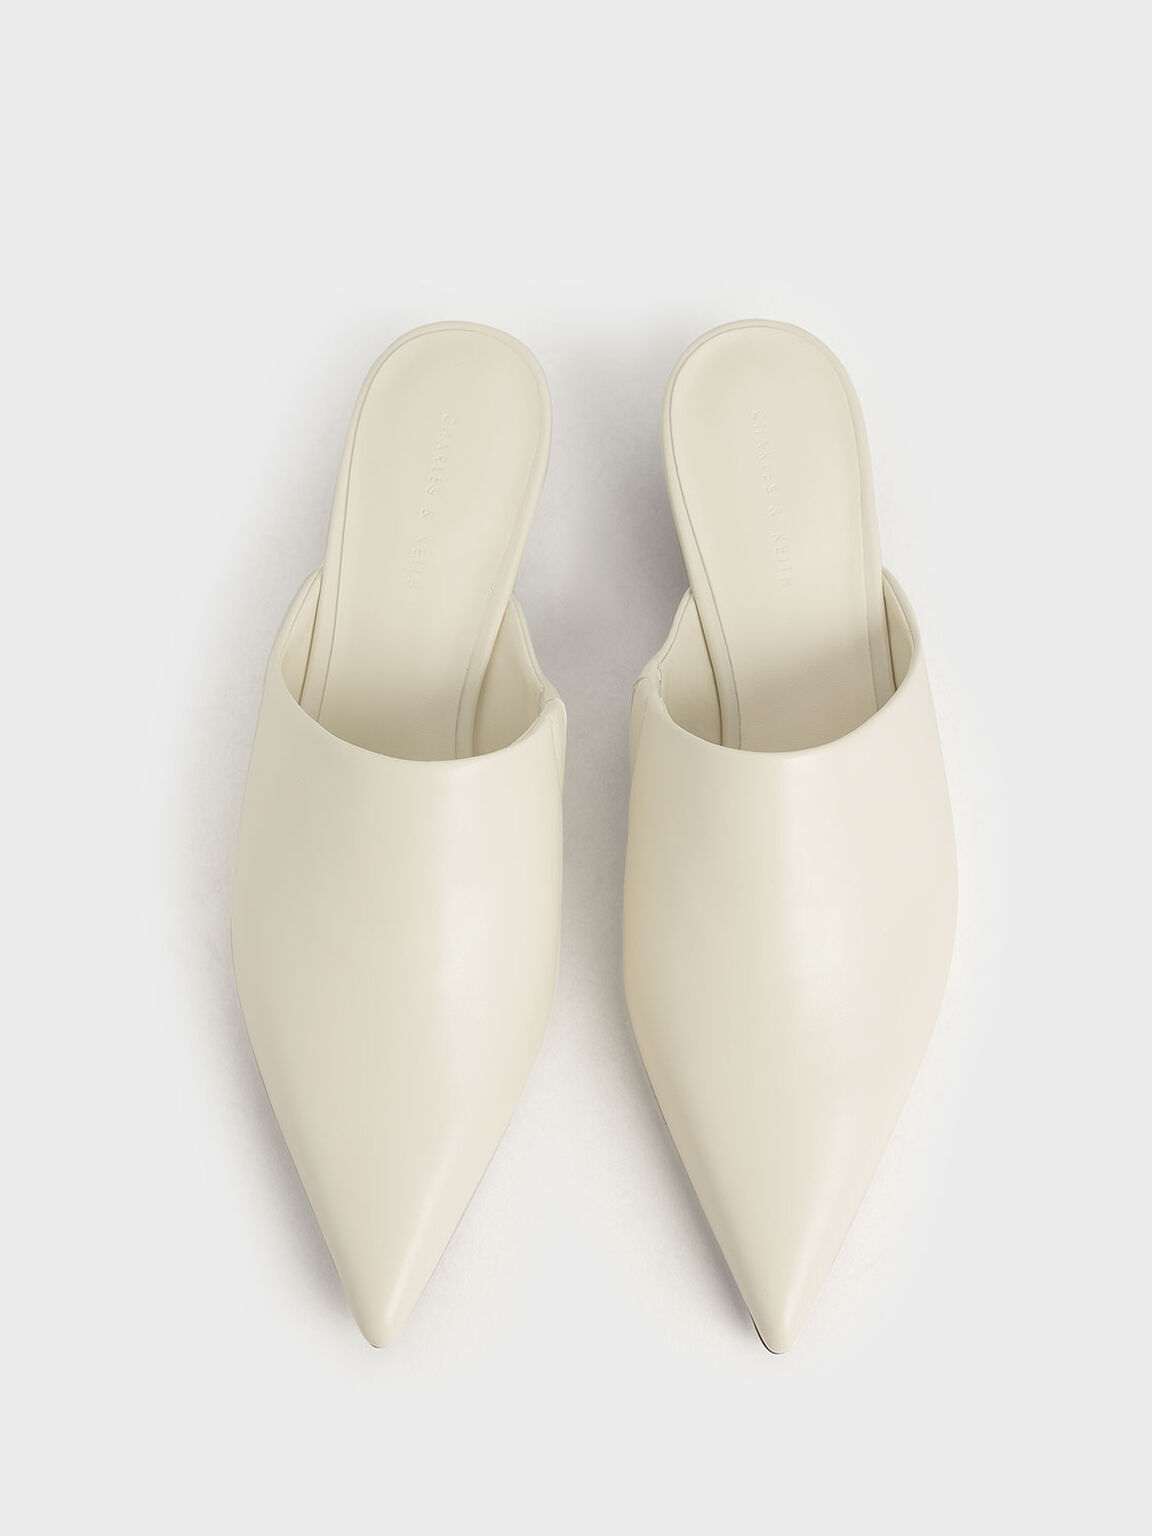 尖頭穆勒鞋, 奶油色, hi-res